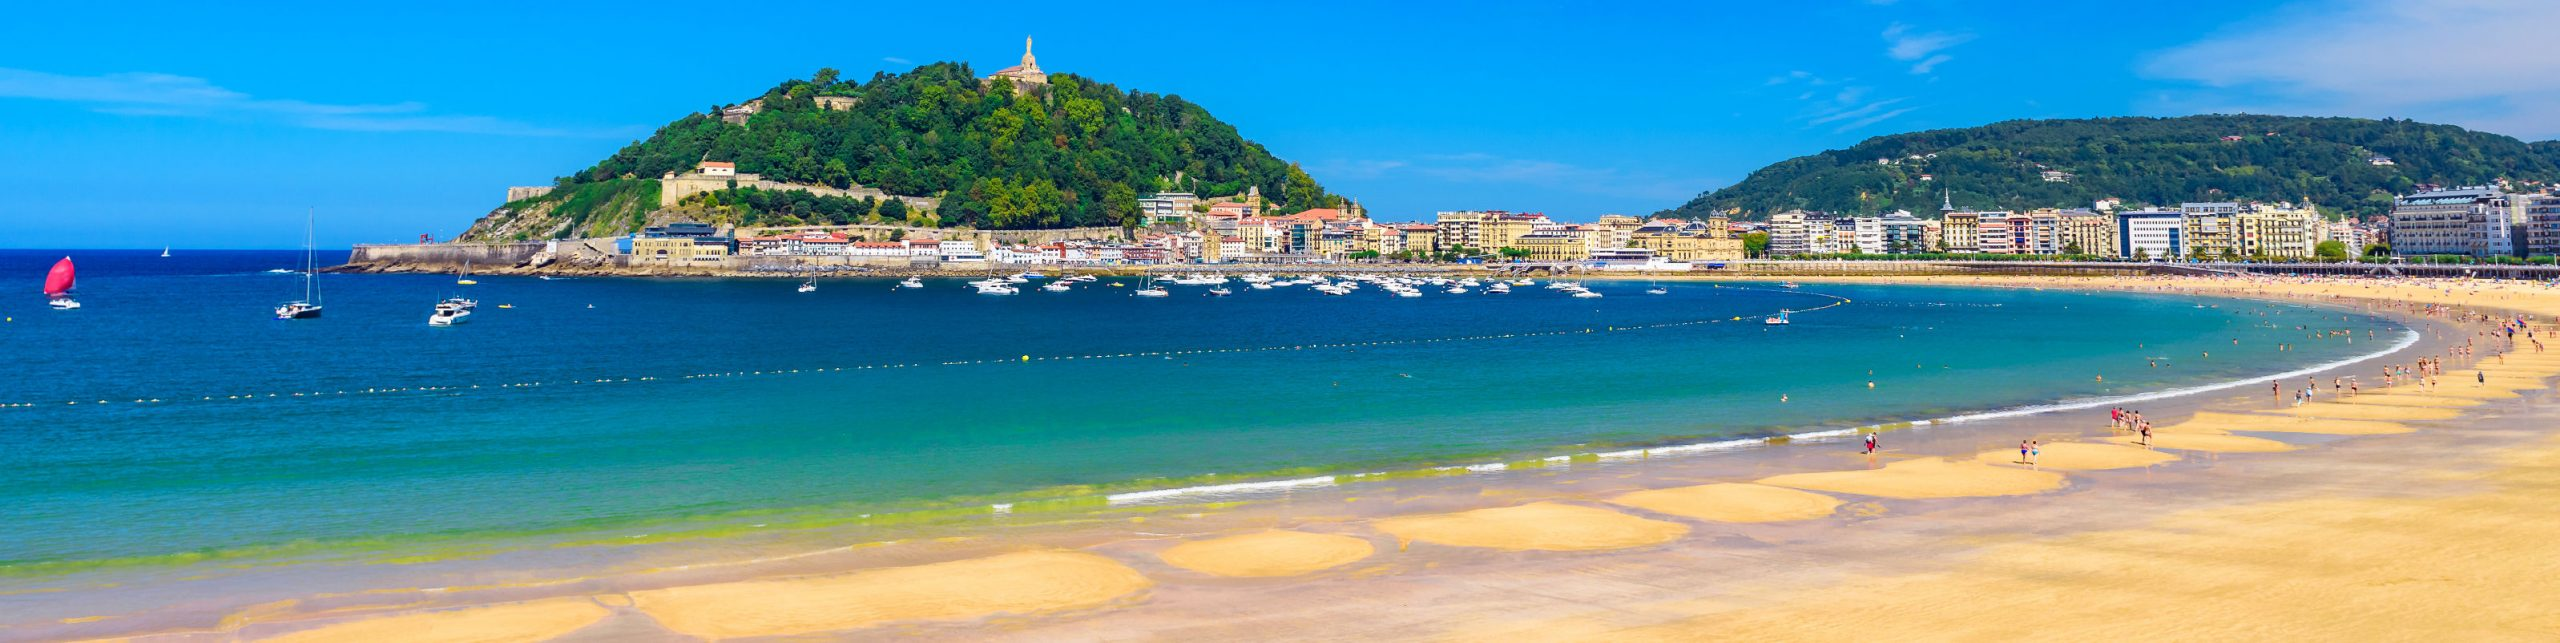 Foto de la playa Concha de Donostia/San Sebastian